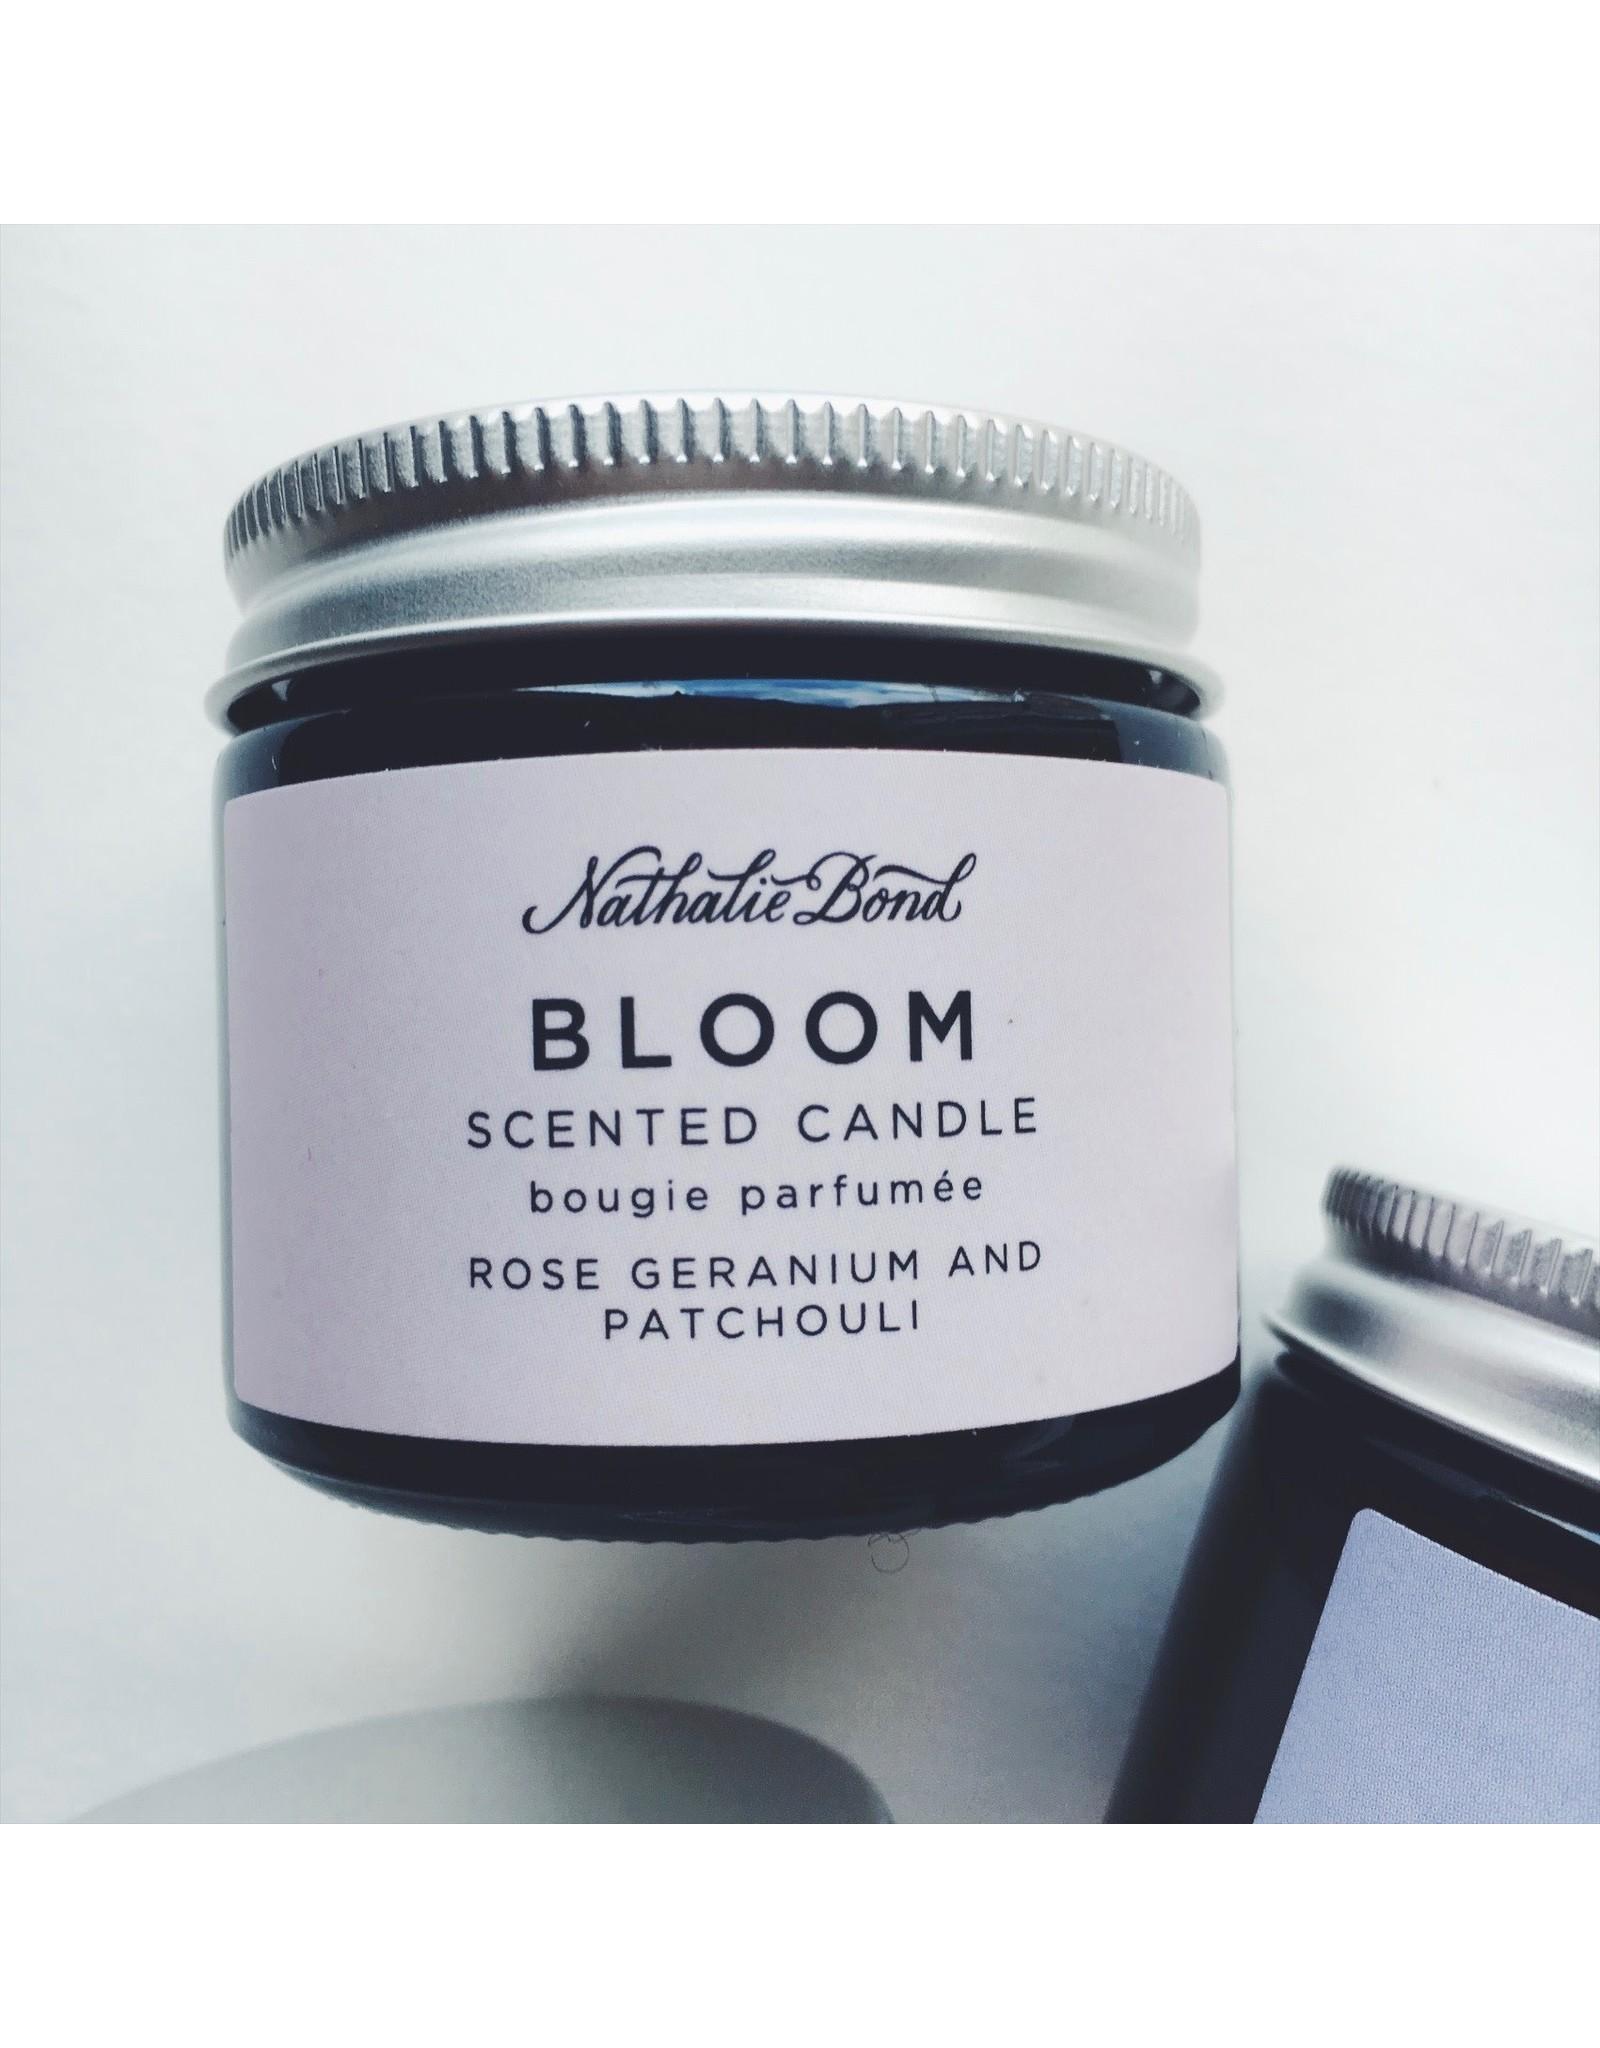 Nathalie Bond Botanical Scented Candle